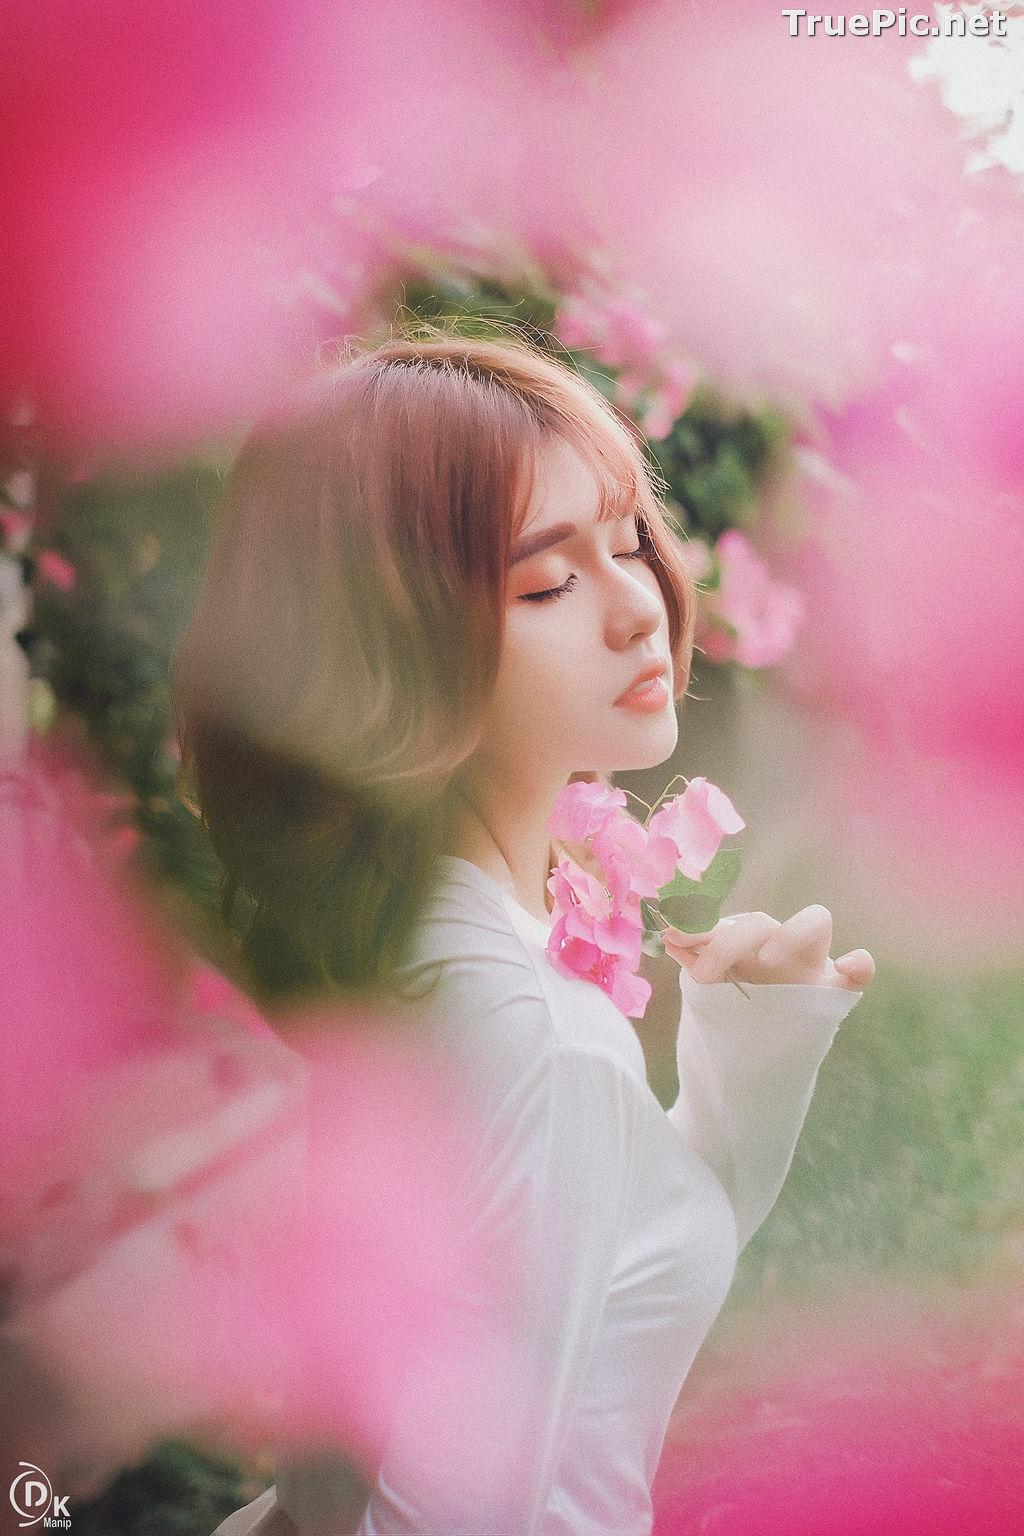 Image Vietnamese Beautiful Model - Bougainvillea Flowering Season - TruePic.net - Picture-9